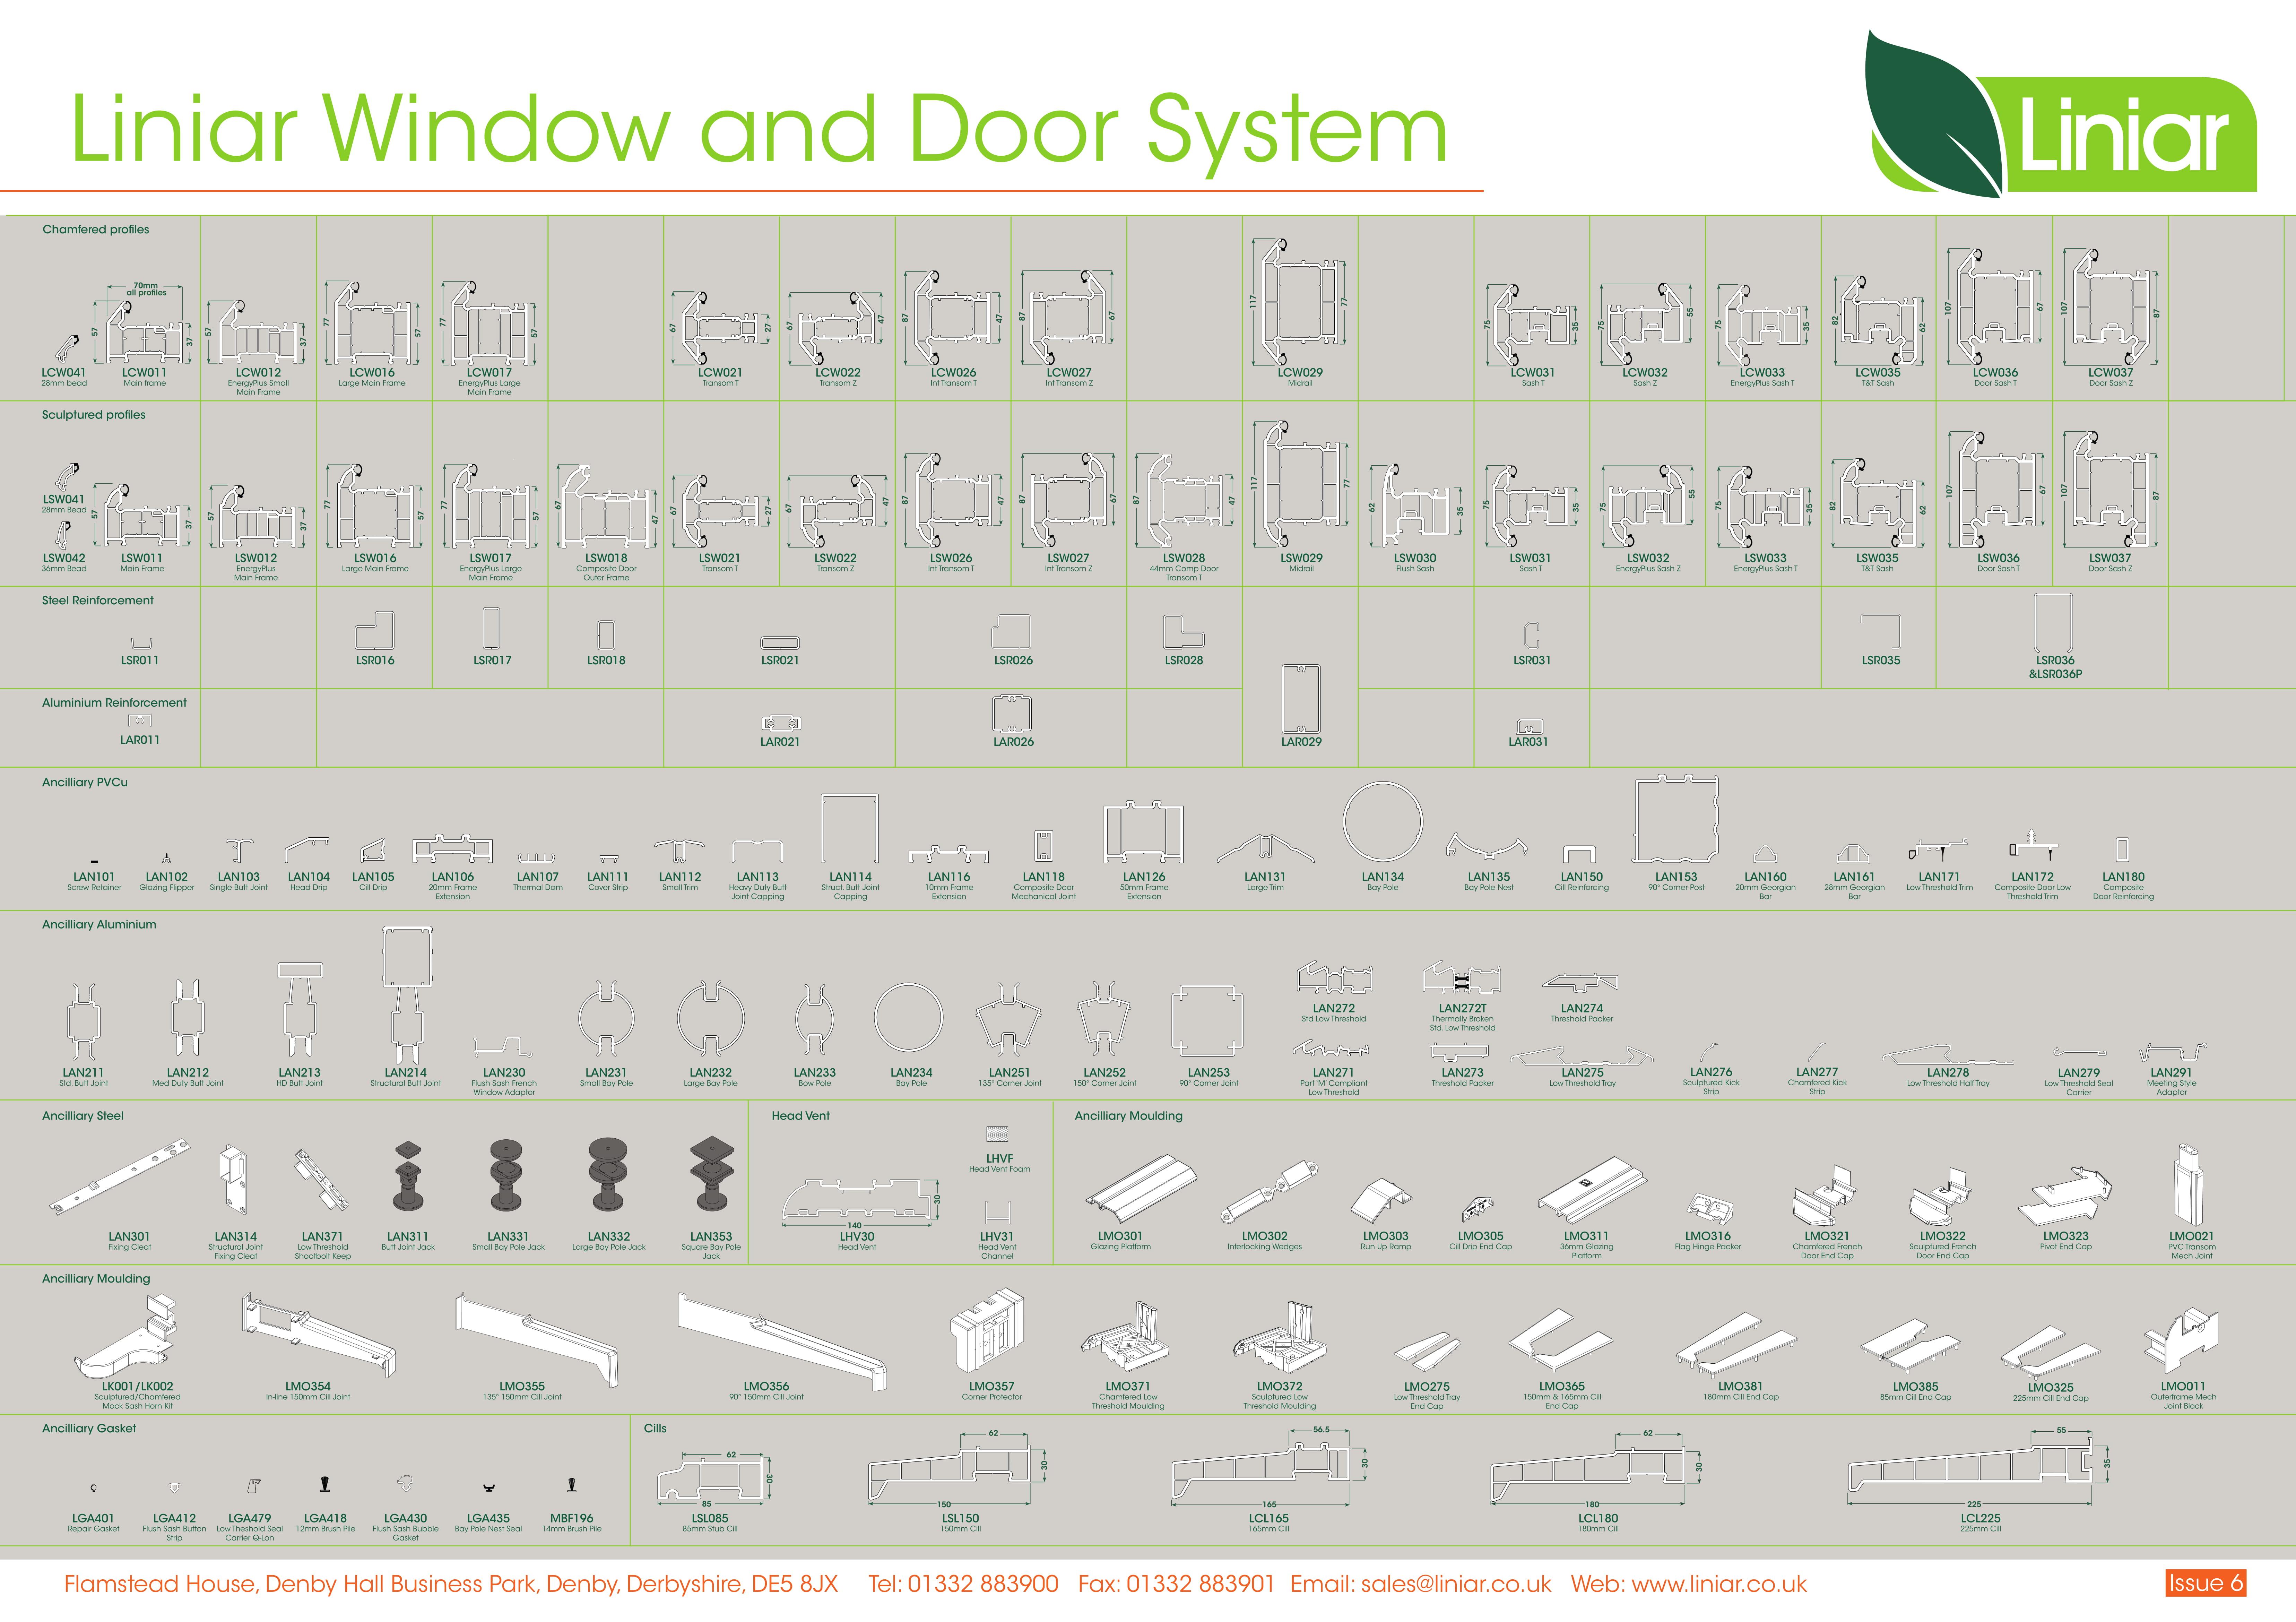 Trade Double Glazing Liniar Window Wall Chart